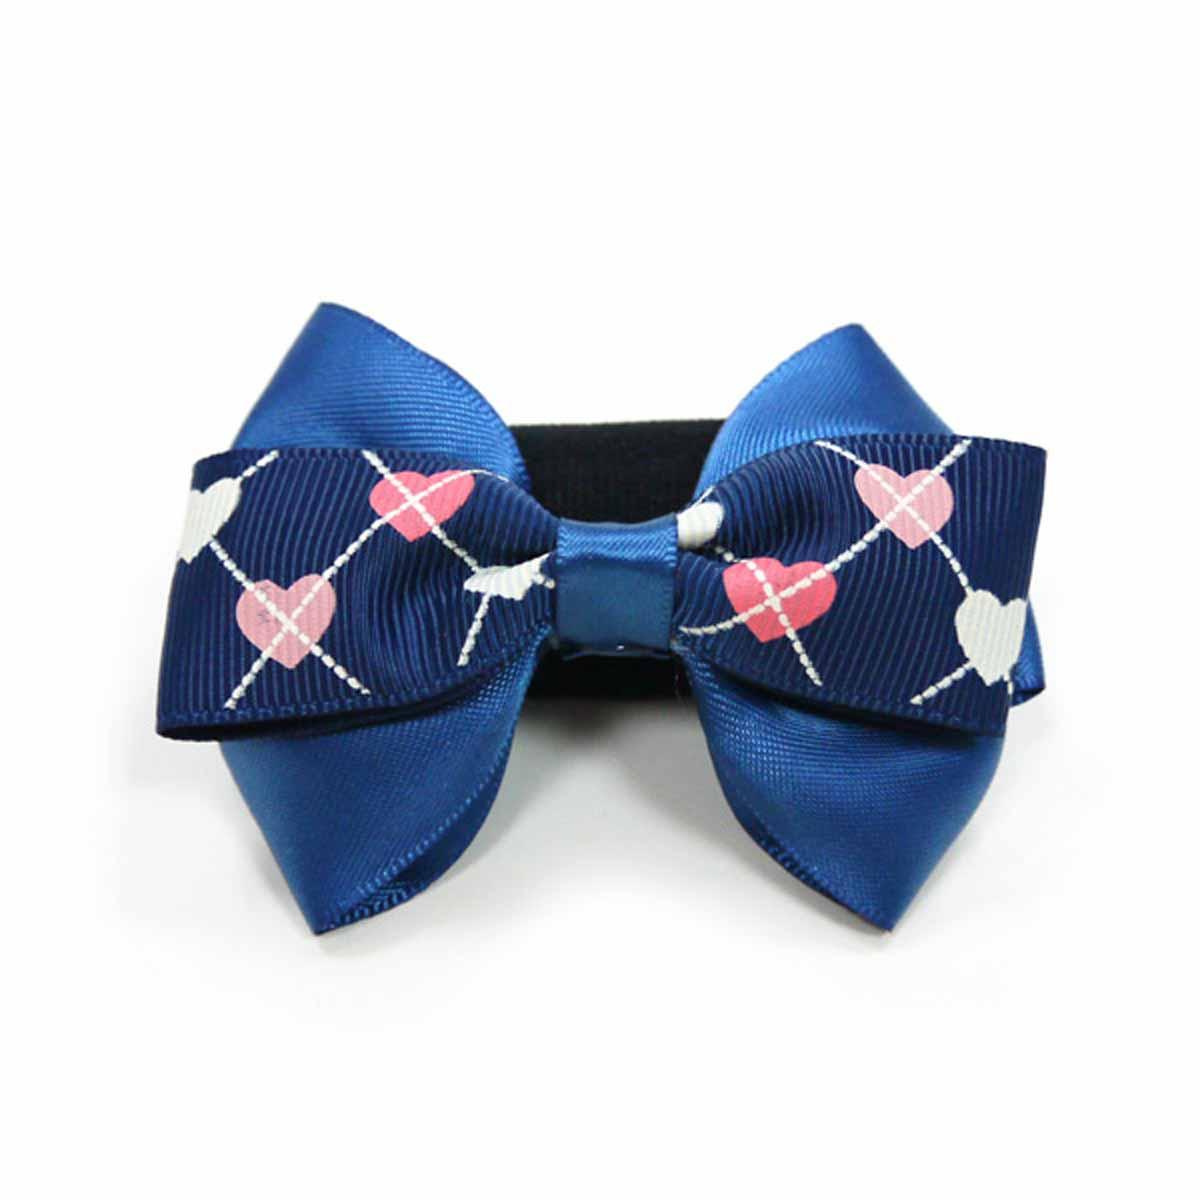 EasyBOW Gentleman Argyle Heart Dog Collar Attachment by Dogo - Blue